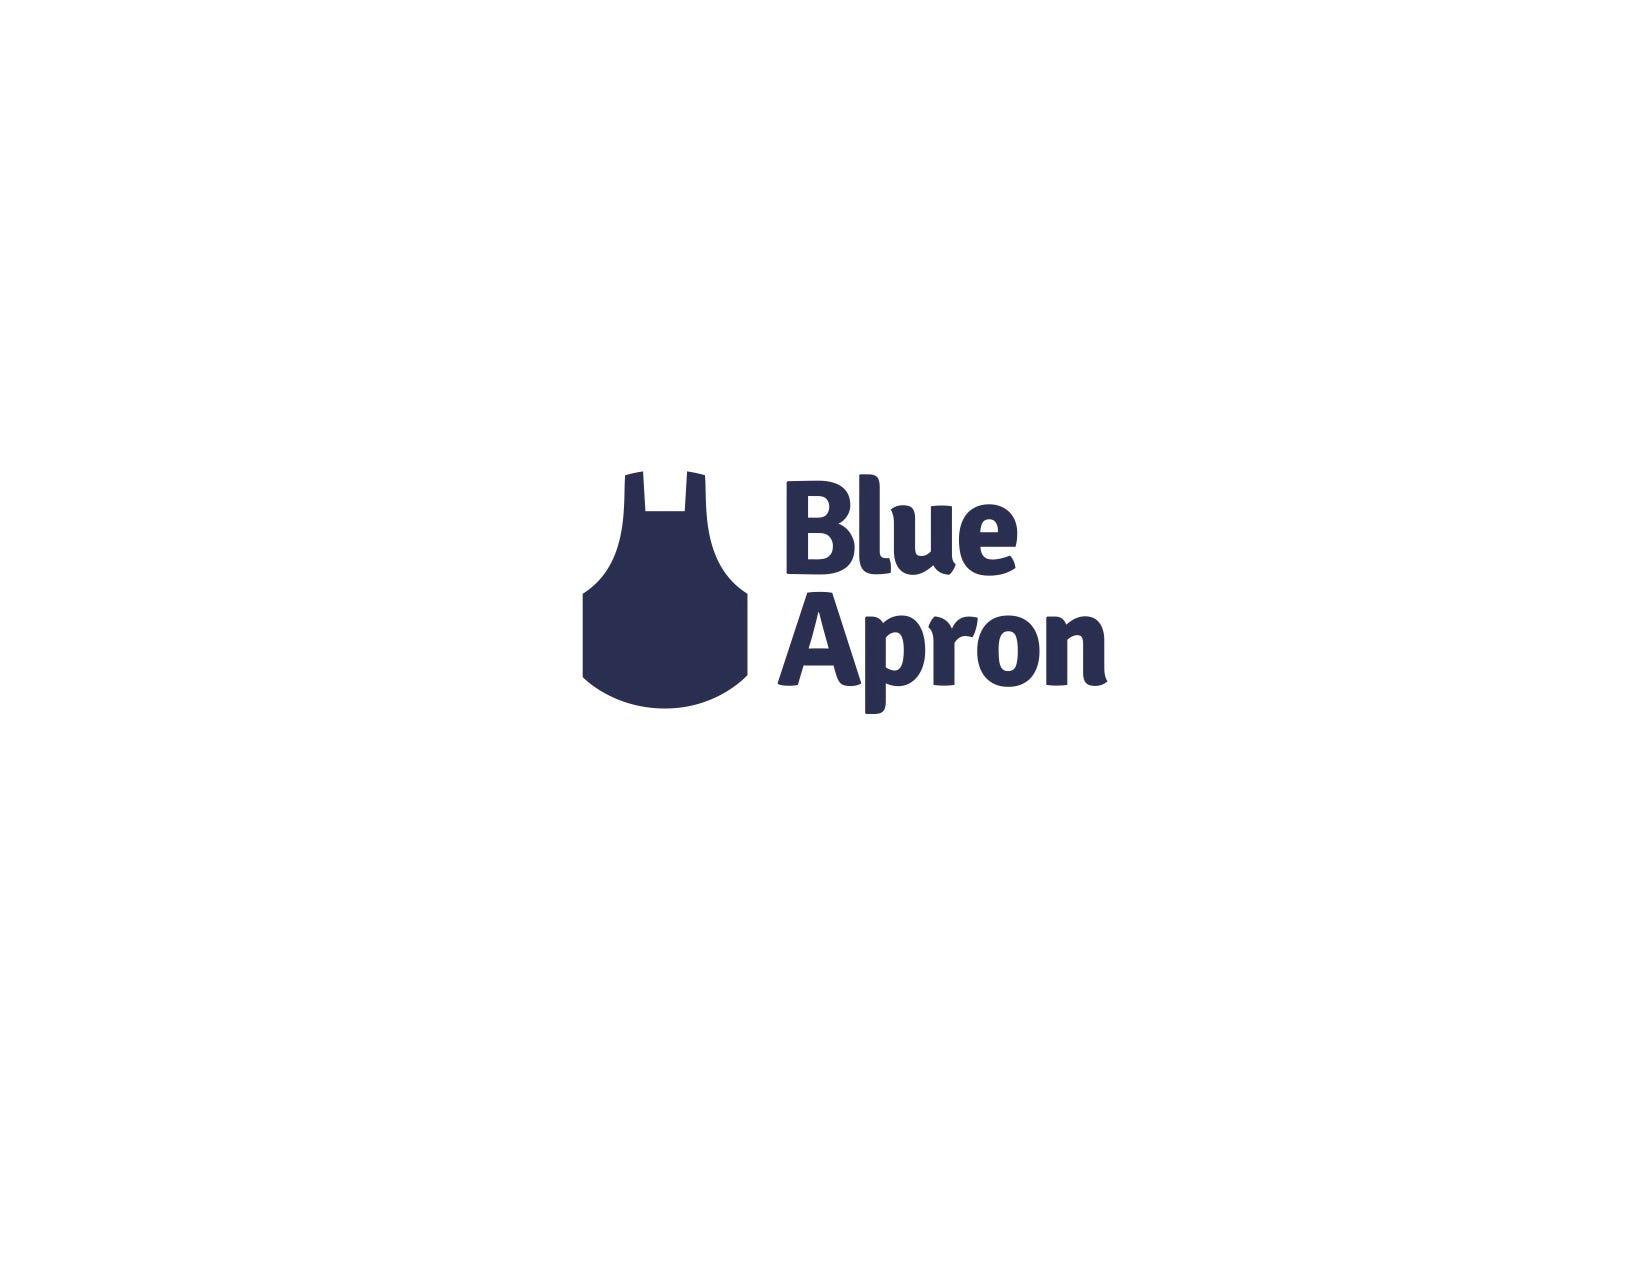 Blue apron recruiting - Blue Apron Recruiting 28